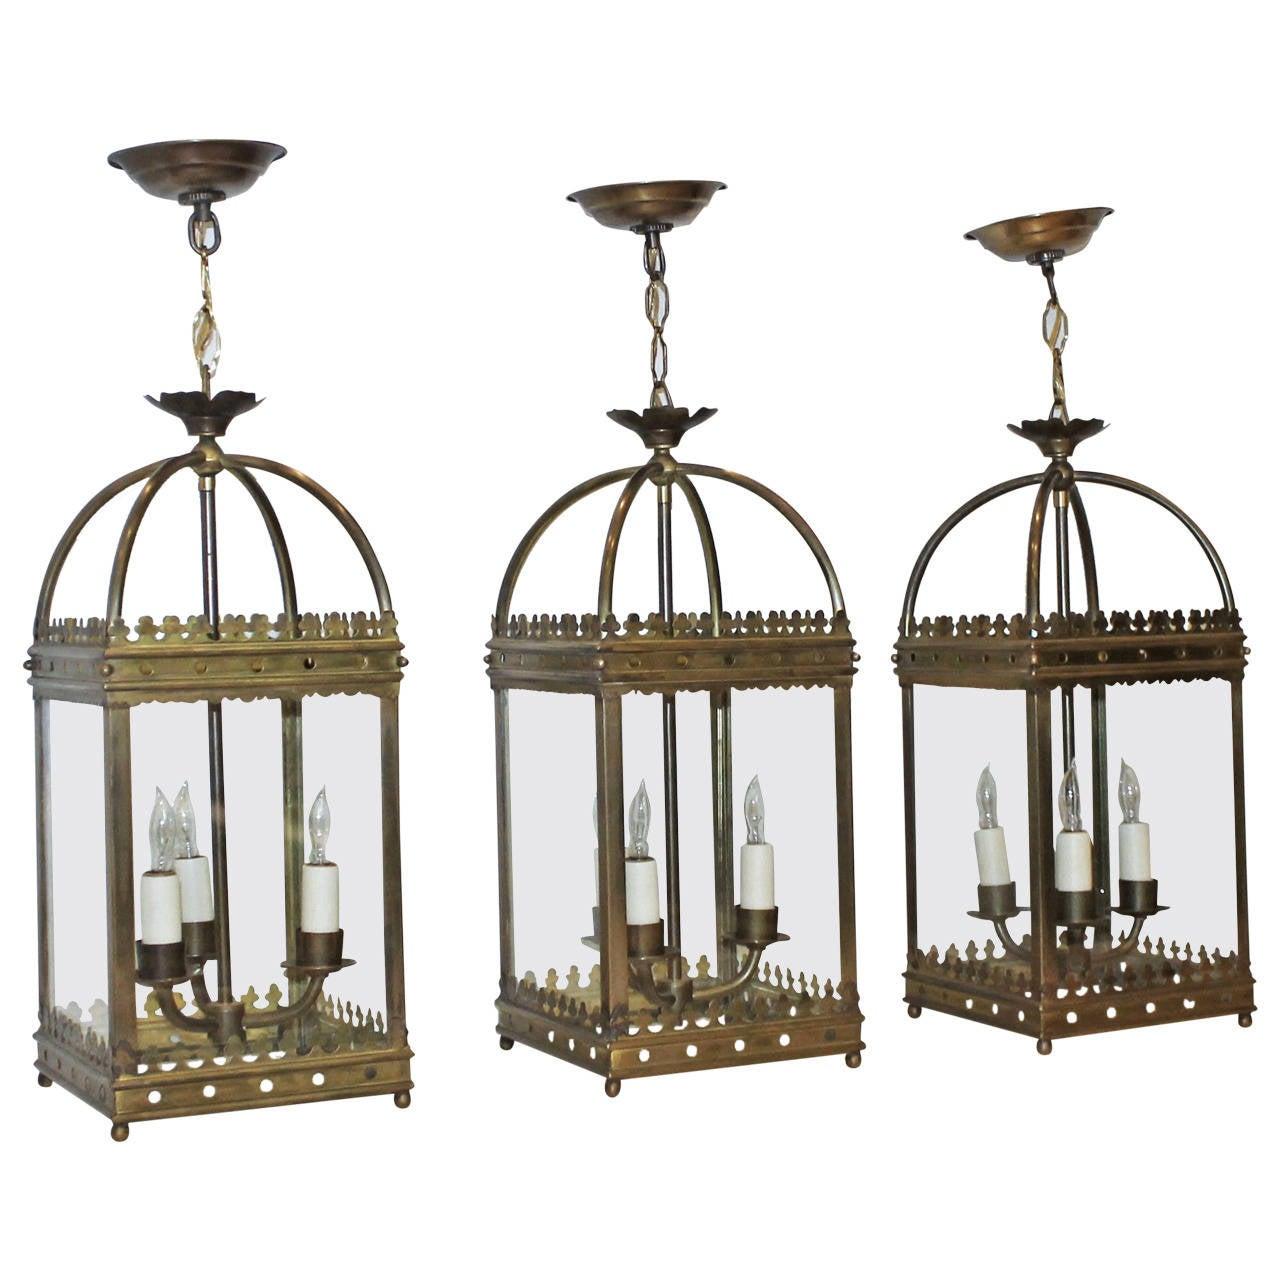 gothic lantern lighting. Set Of Three Brass, English Gothic Revival Style Hall Lanterns Or Pendants For Sale Lantern Lighting